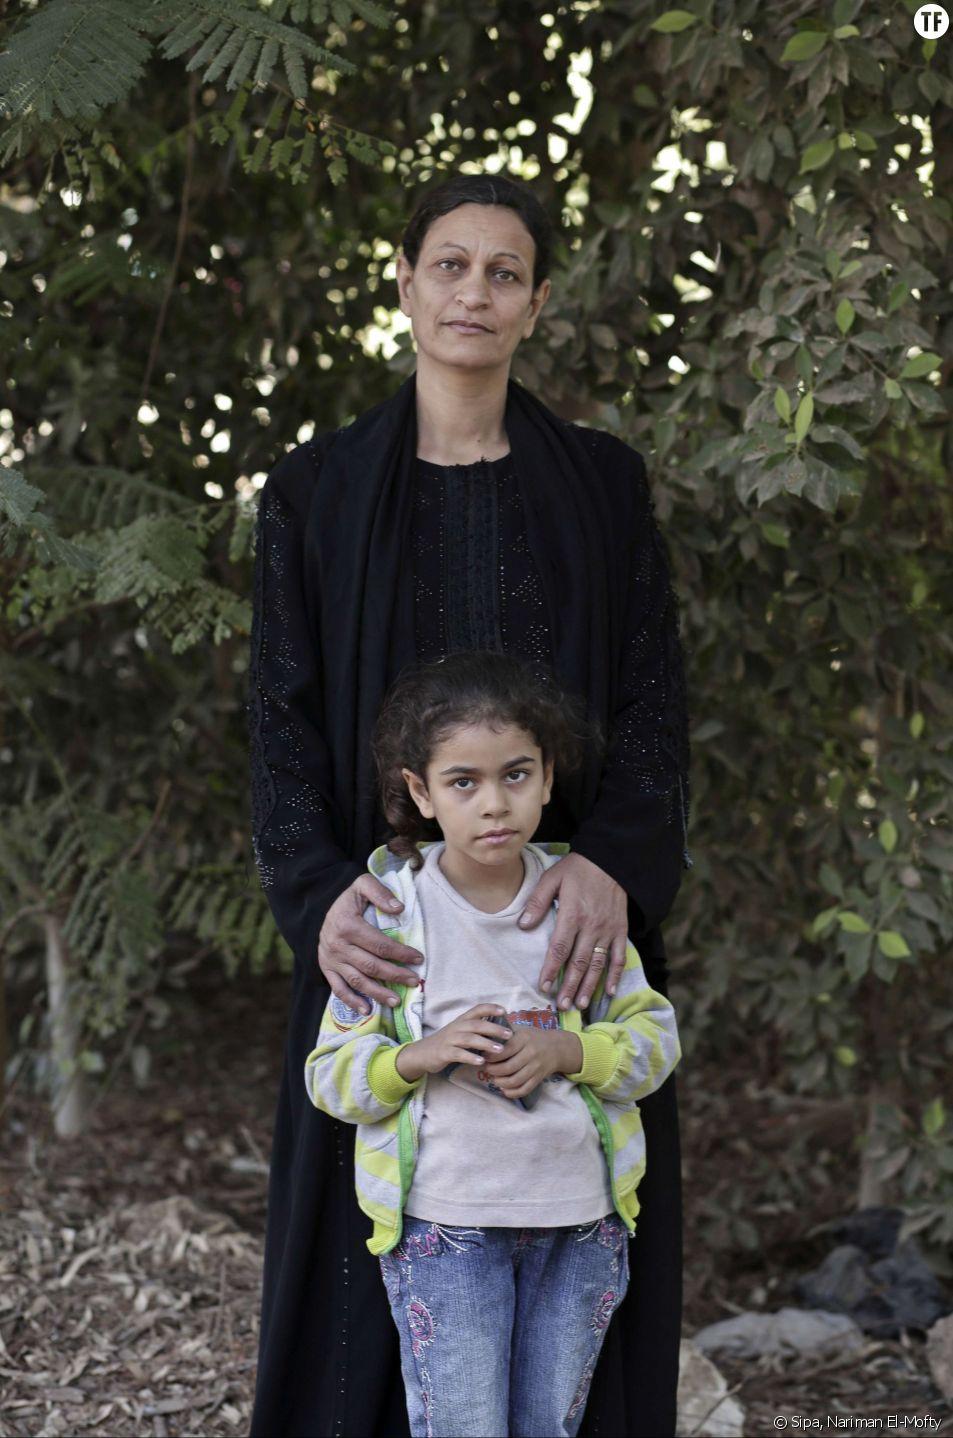 Hamdeya Nazmy, victime de MGF dans son enfance, pose avec sa fille de cinq ans Demyana en Egypte.